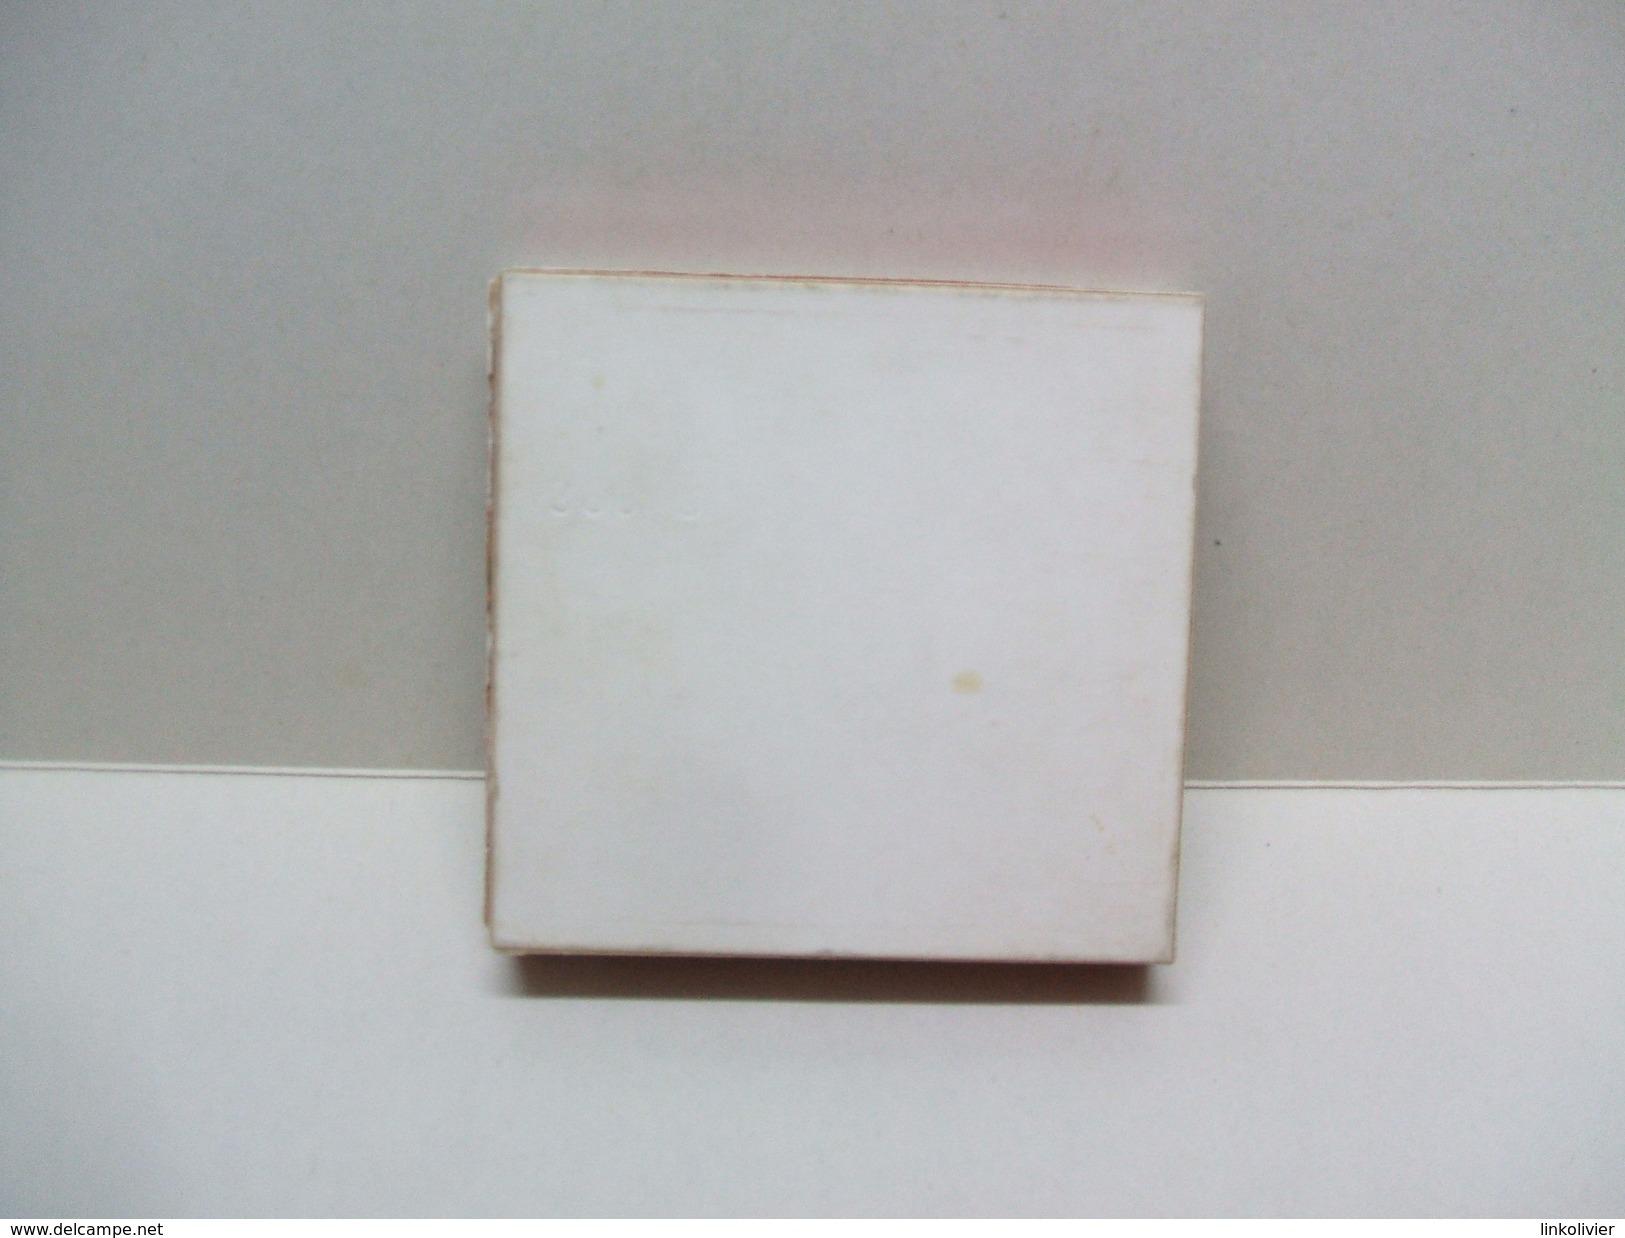 BOÎTE REINITAS En Carton 20 CIGARILLOS (vide) - Contenitore Di Sigari